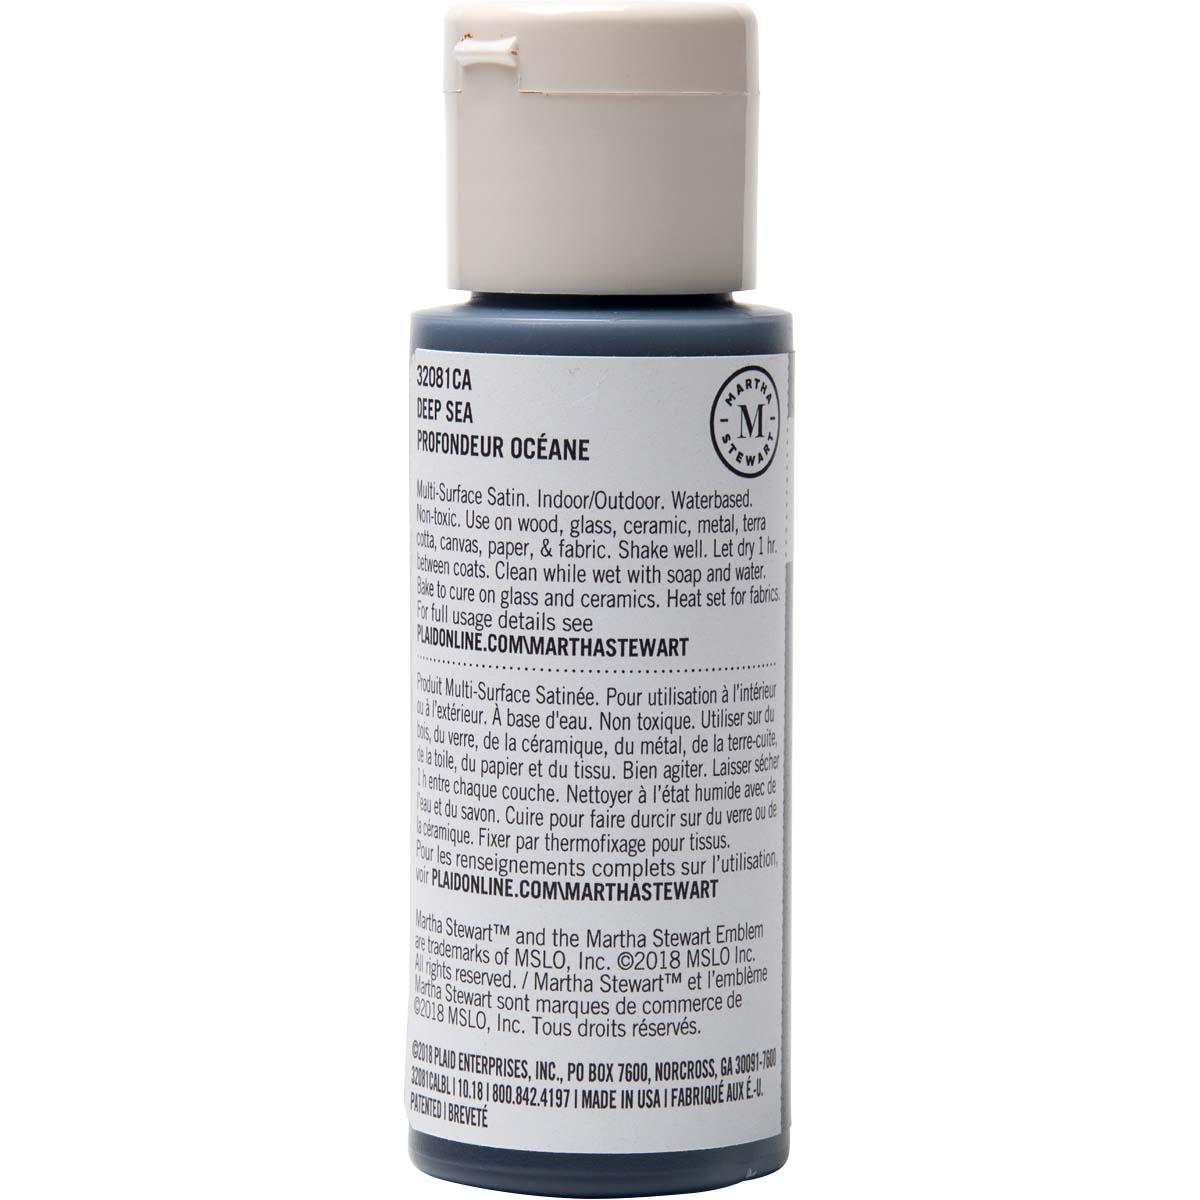 Martha Stewart ® Multi-Surface Satin Acrylic Craft Paint - Deep Sea, 2 oz.